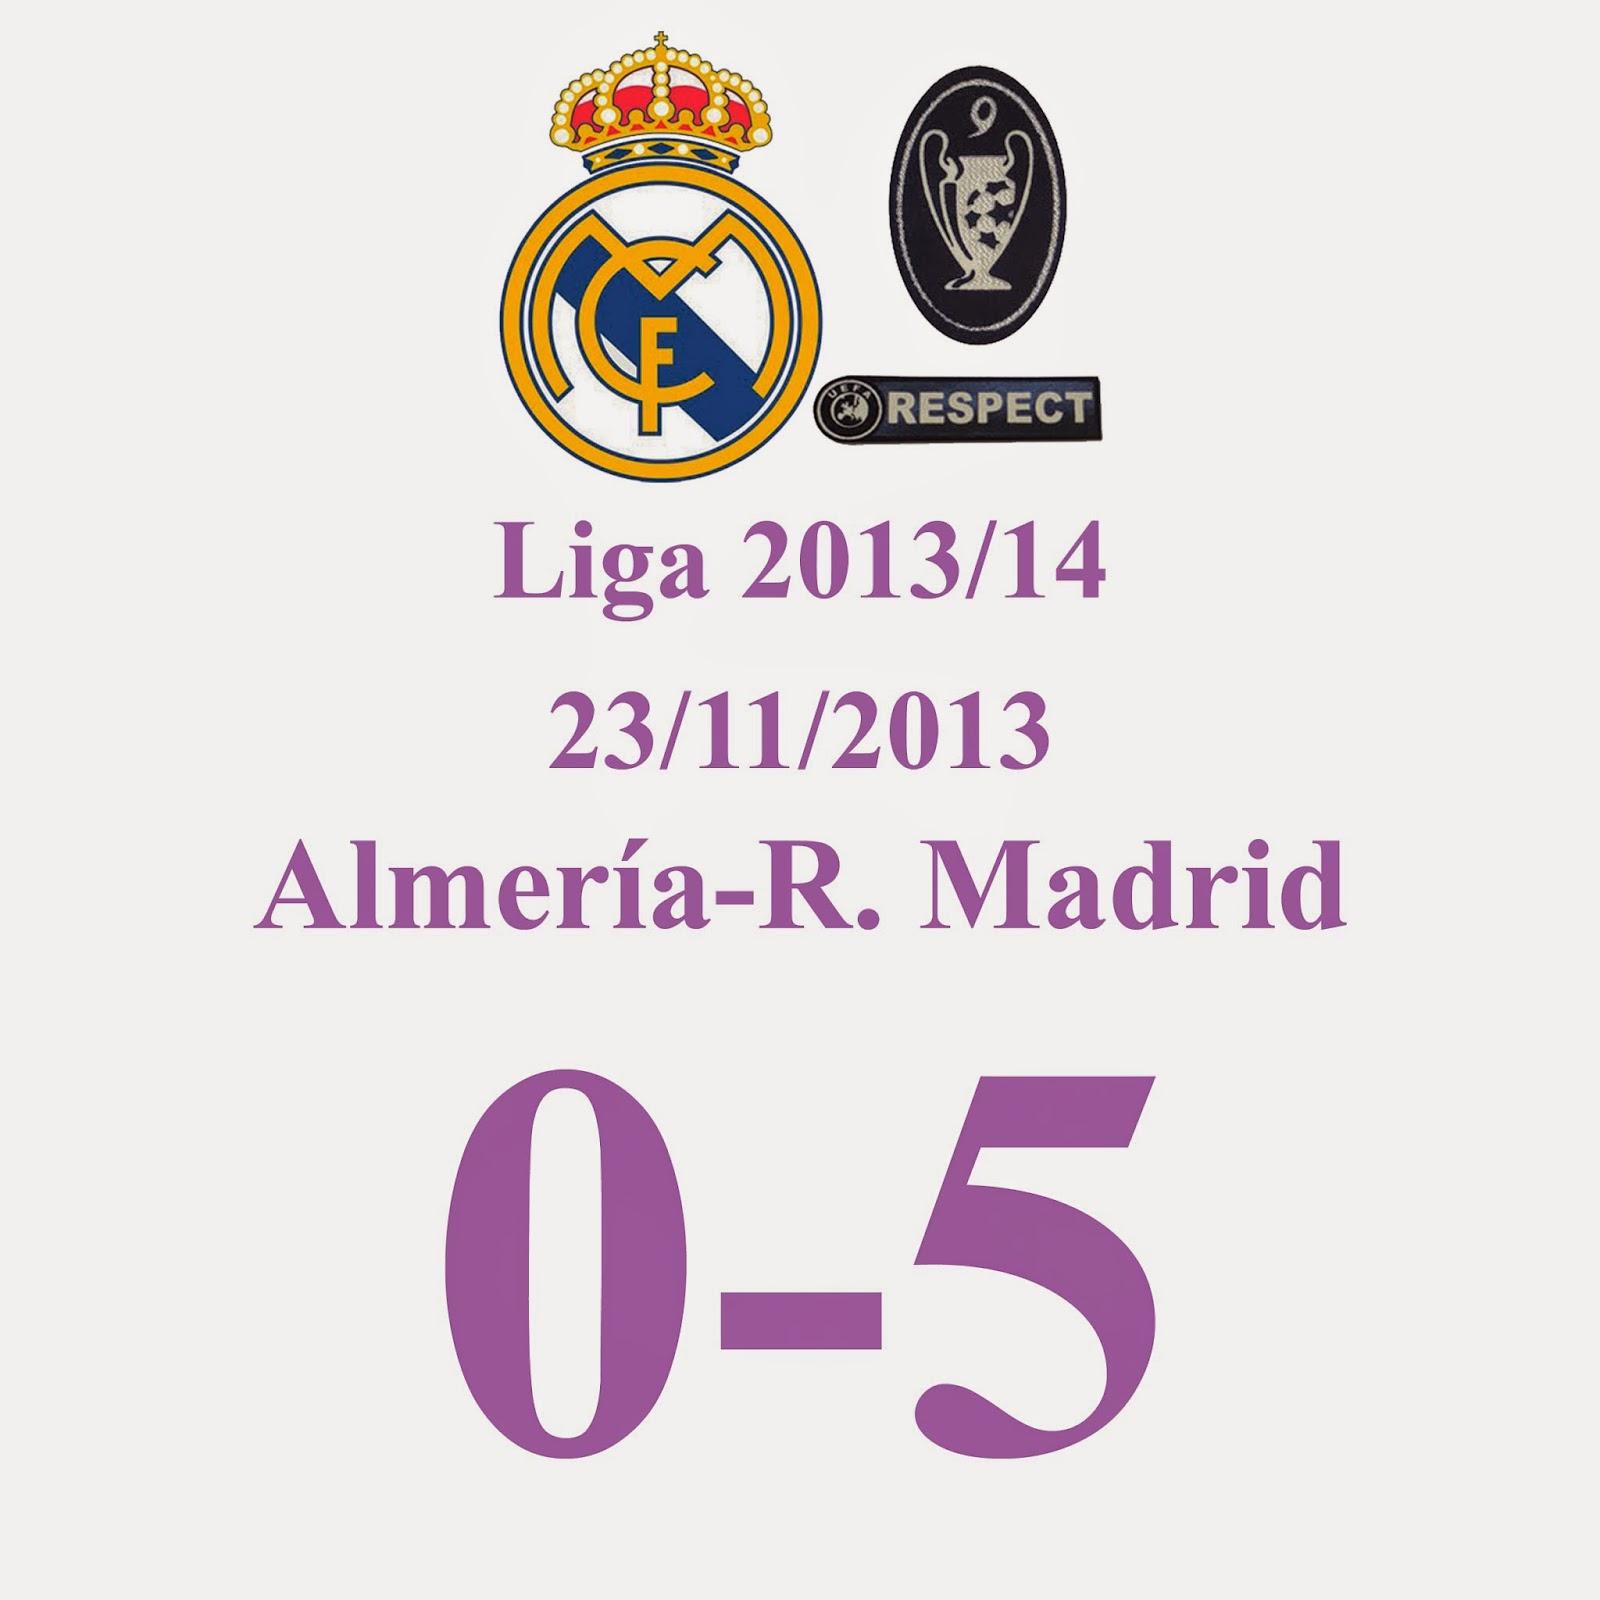 Almería 0 - 5 Real Madrid (Jornada 14) 23/11/2013 - Otra gran goleada del Real Madrid